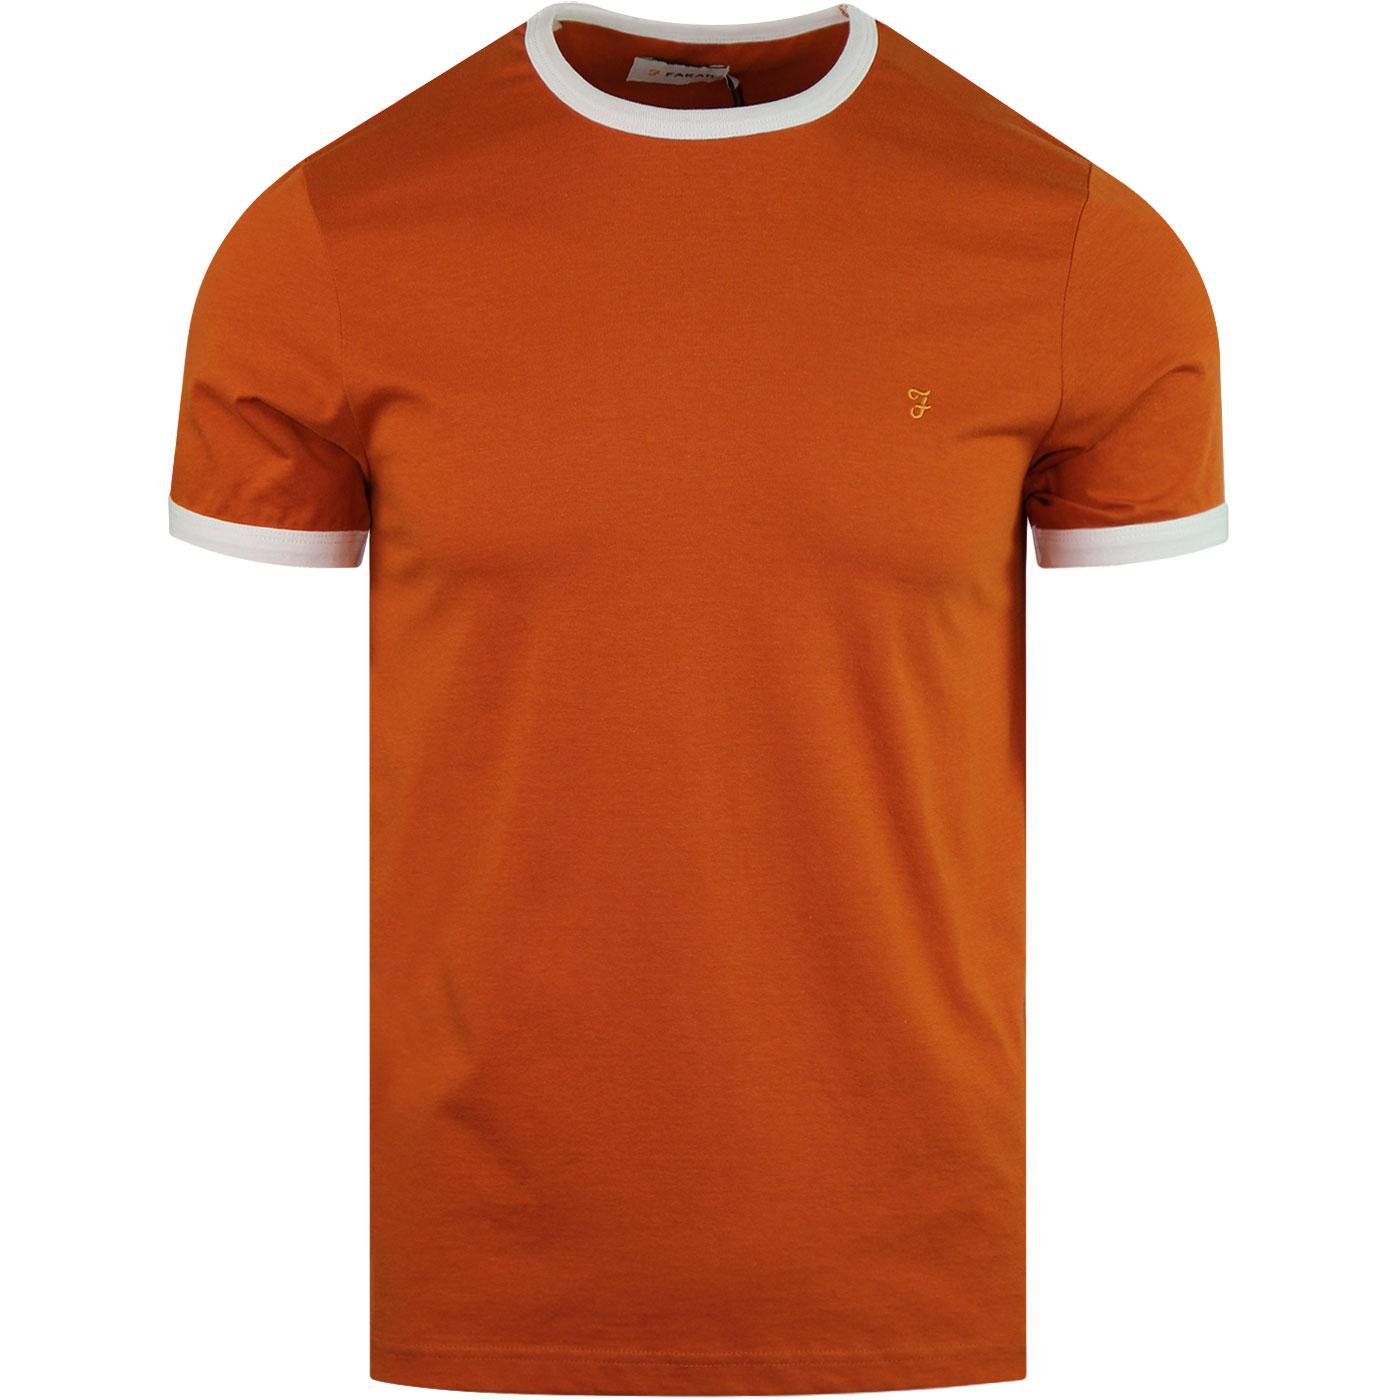 Groves FARAH Retro Mod Ringer T-Shirt (Goldfish)